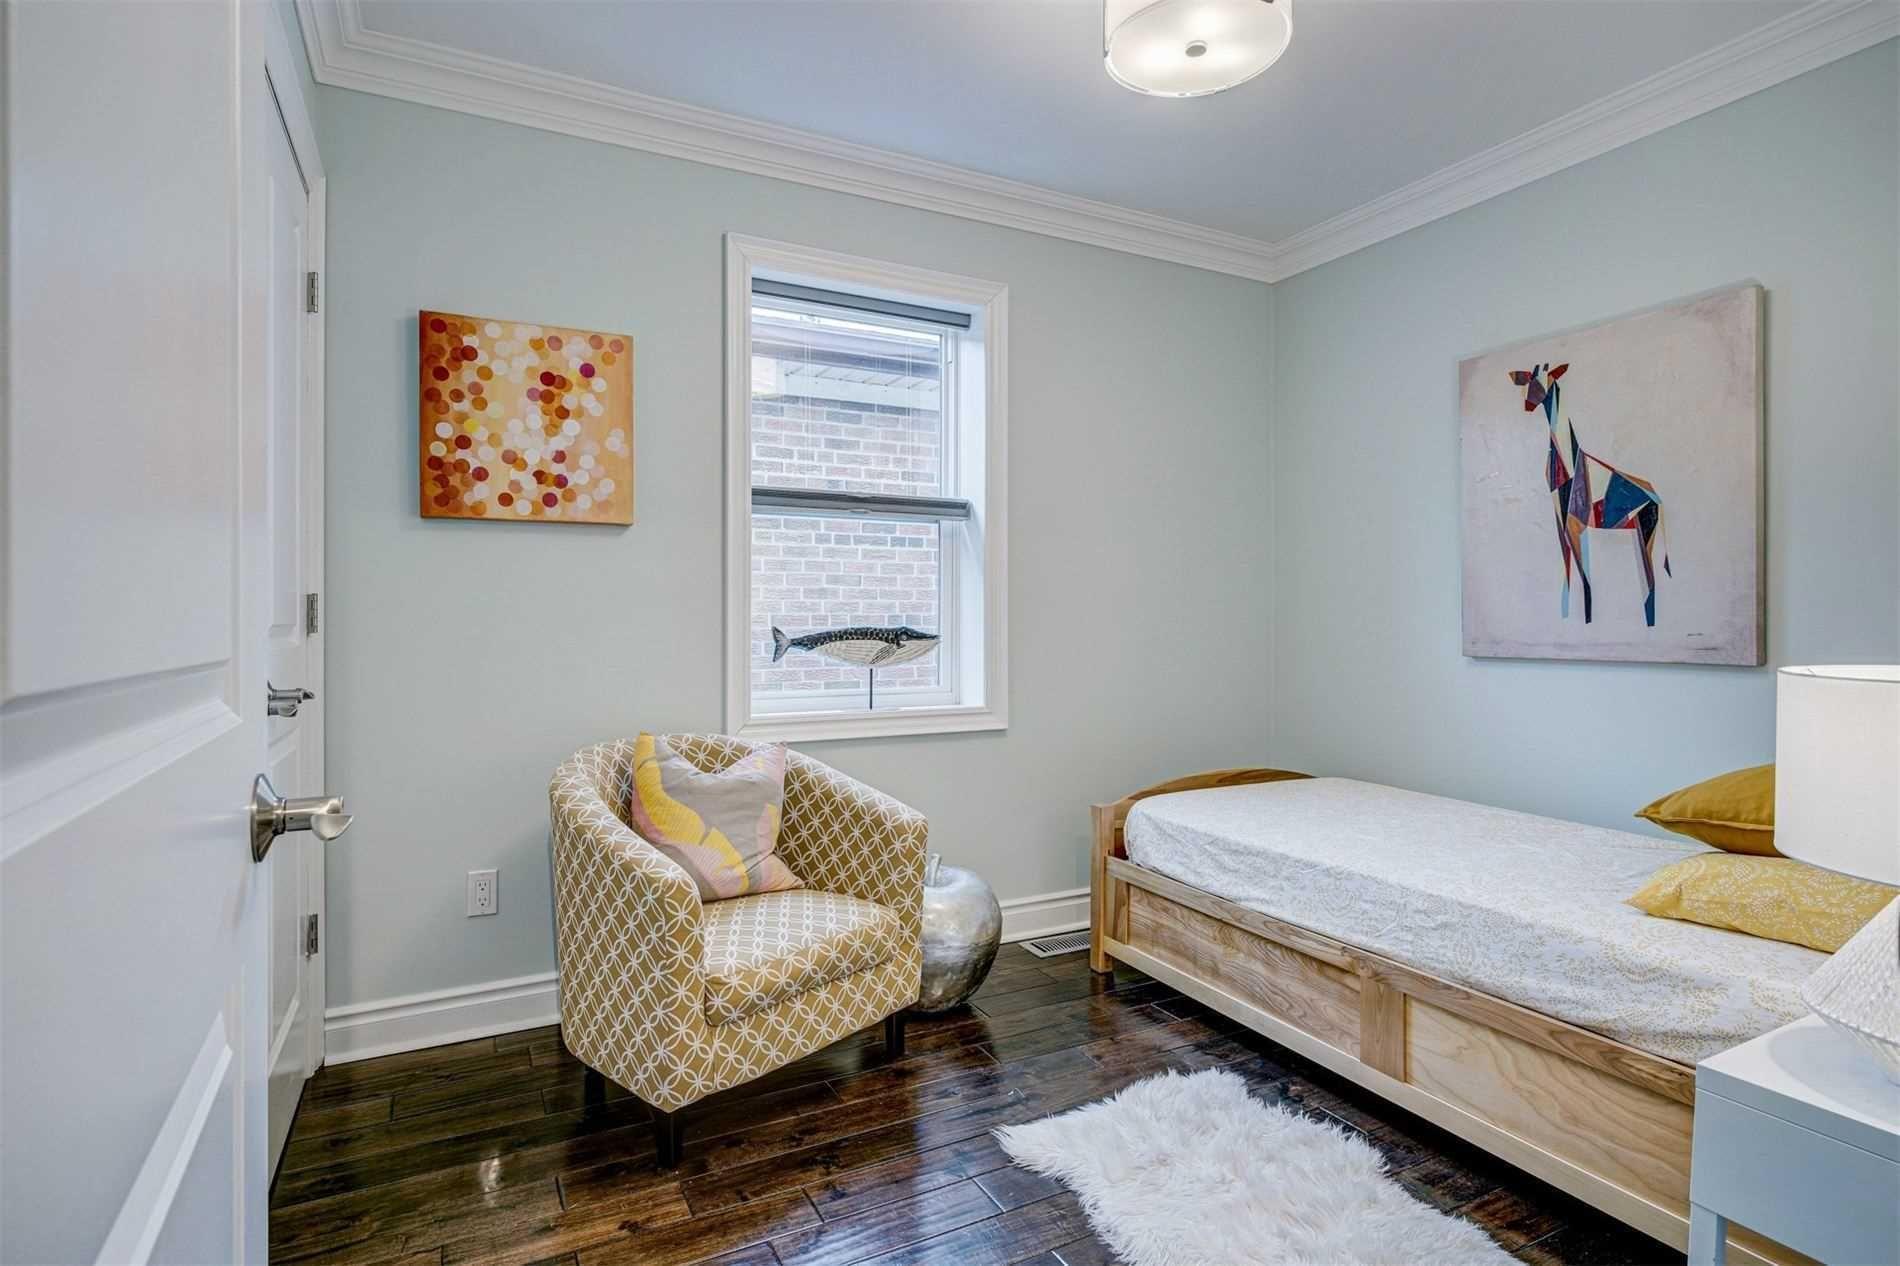 Photo 20: Photos: 92 Holborne Avenue in Toronto: Danforth Village-East York House (2-Storey) for sale (Toronto E03)  : MLS®# E5204452